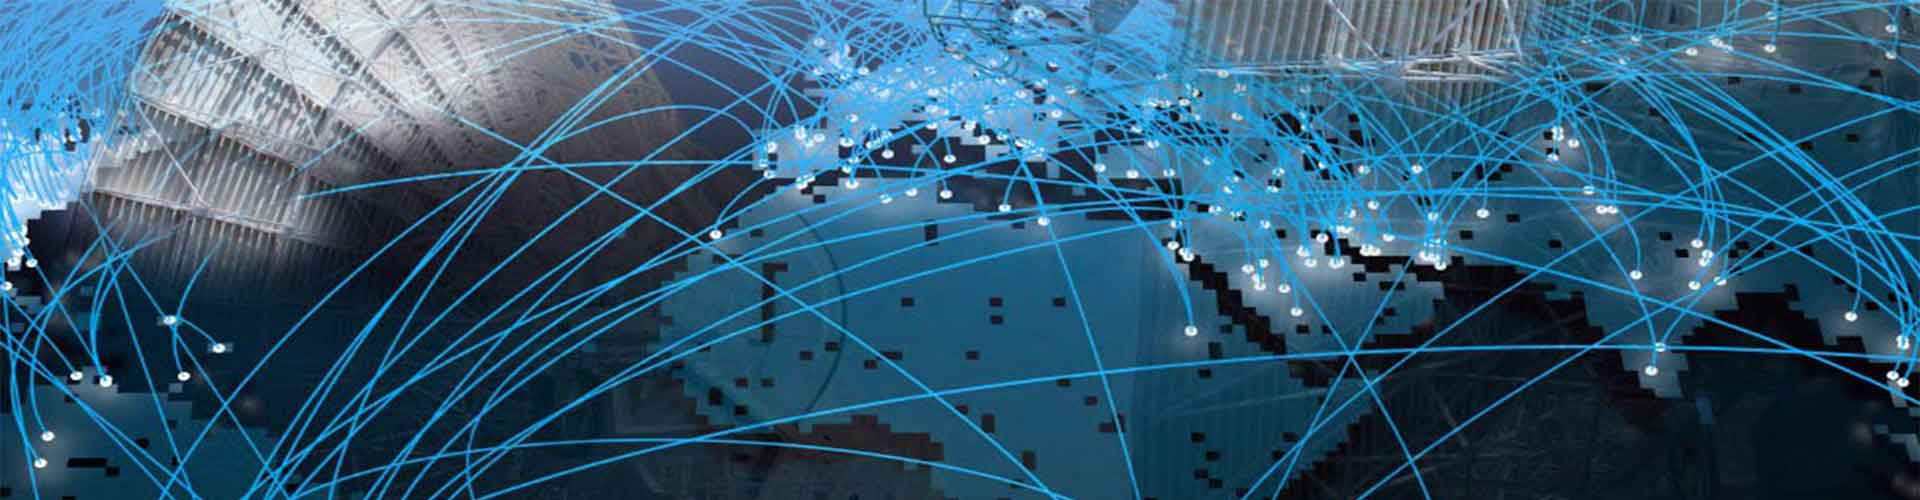 telecom points across globe